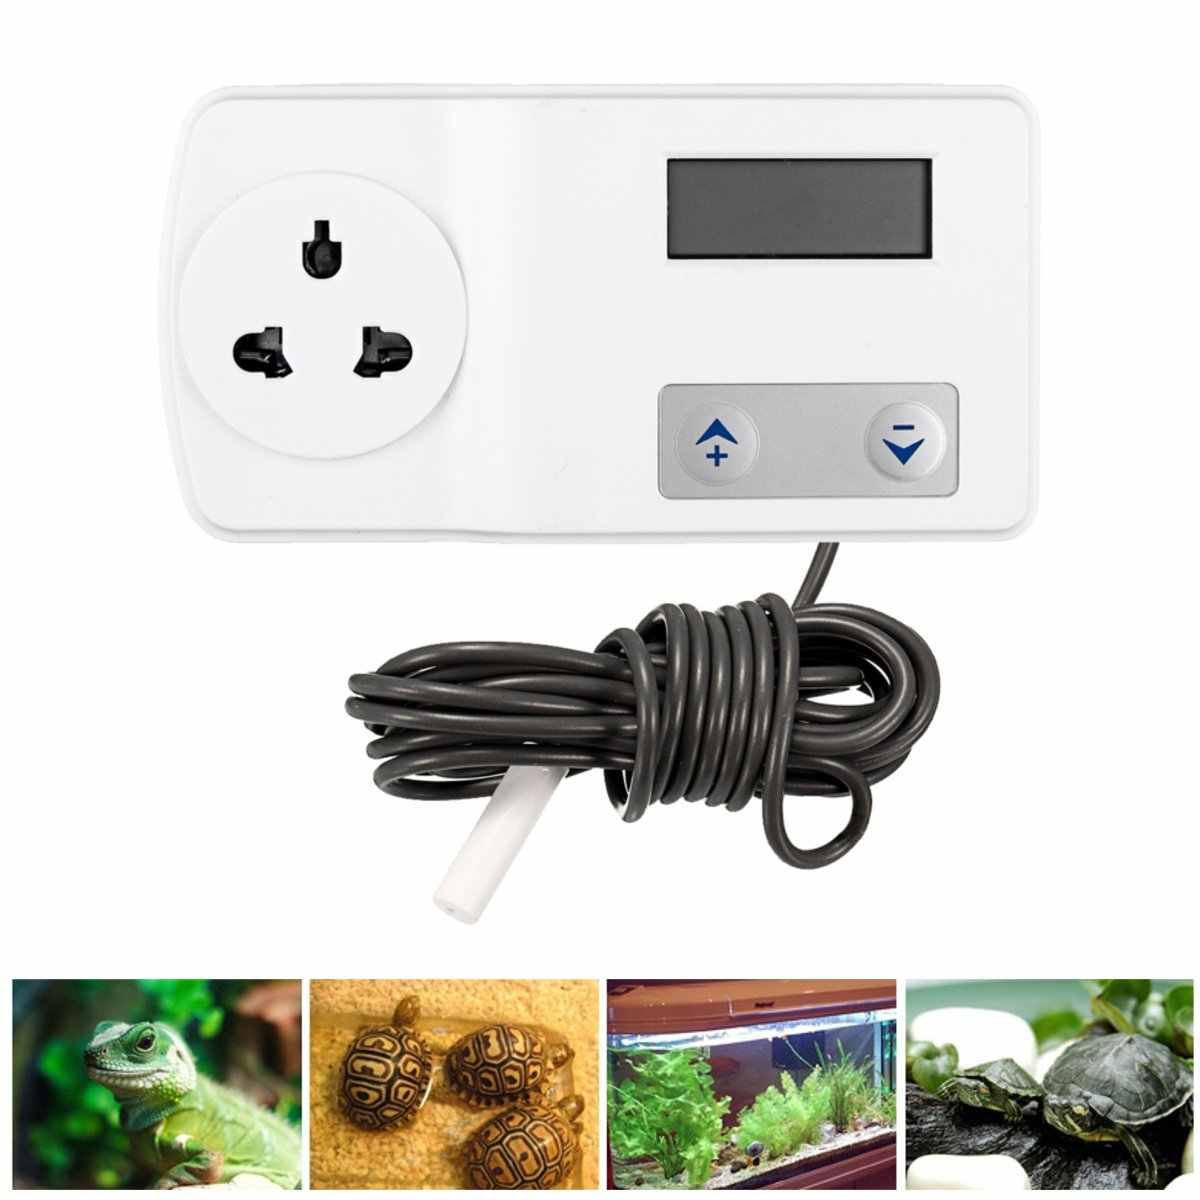 White Plastic Digital Thermostat Pet Reptiles Crab Snake Lizard Feeding Box Terrarium Temperature Control Products Supplies